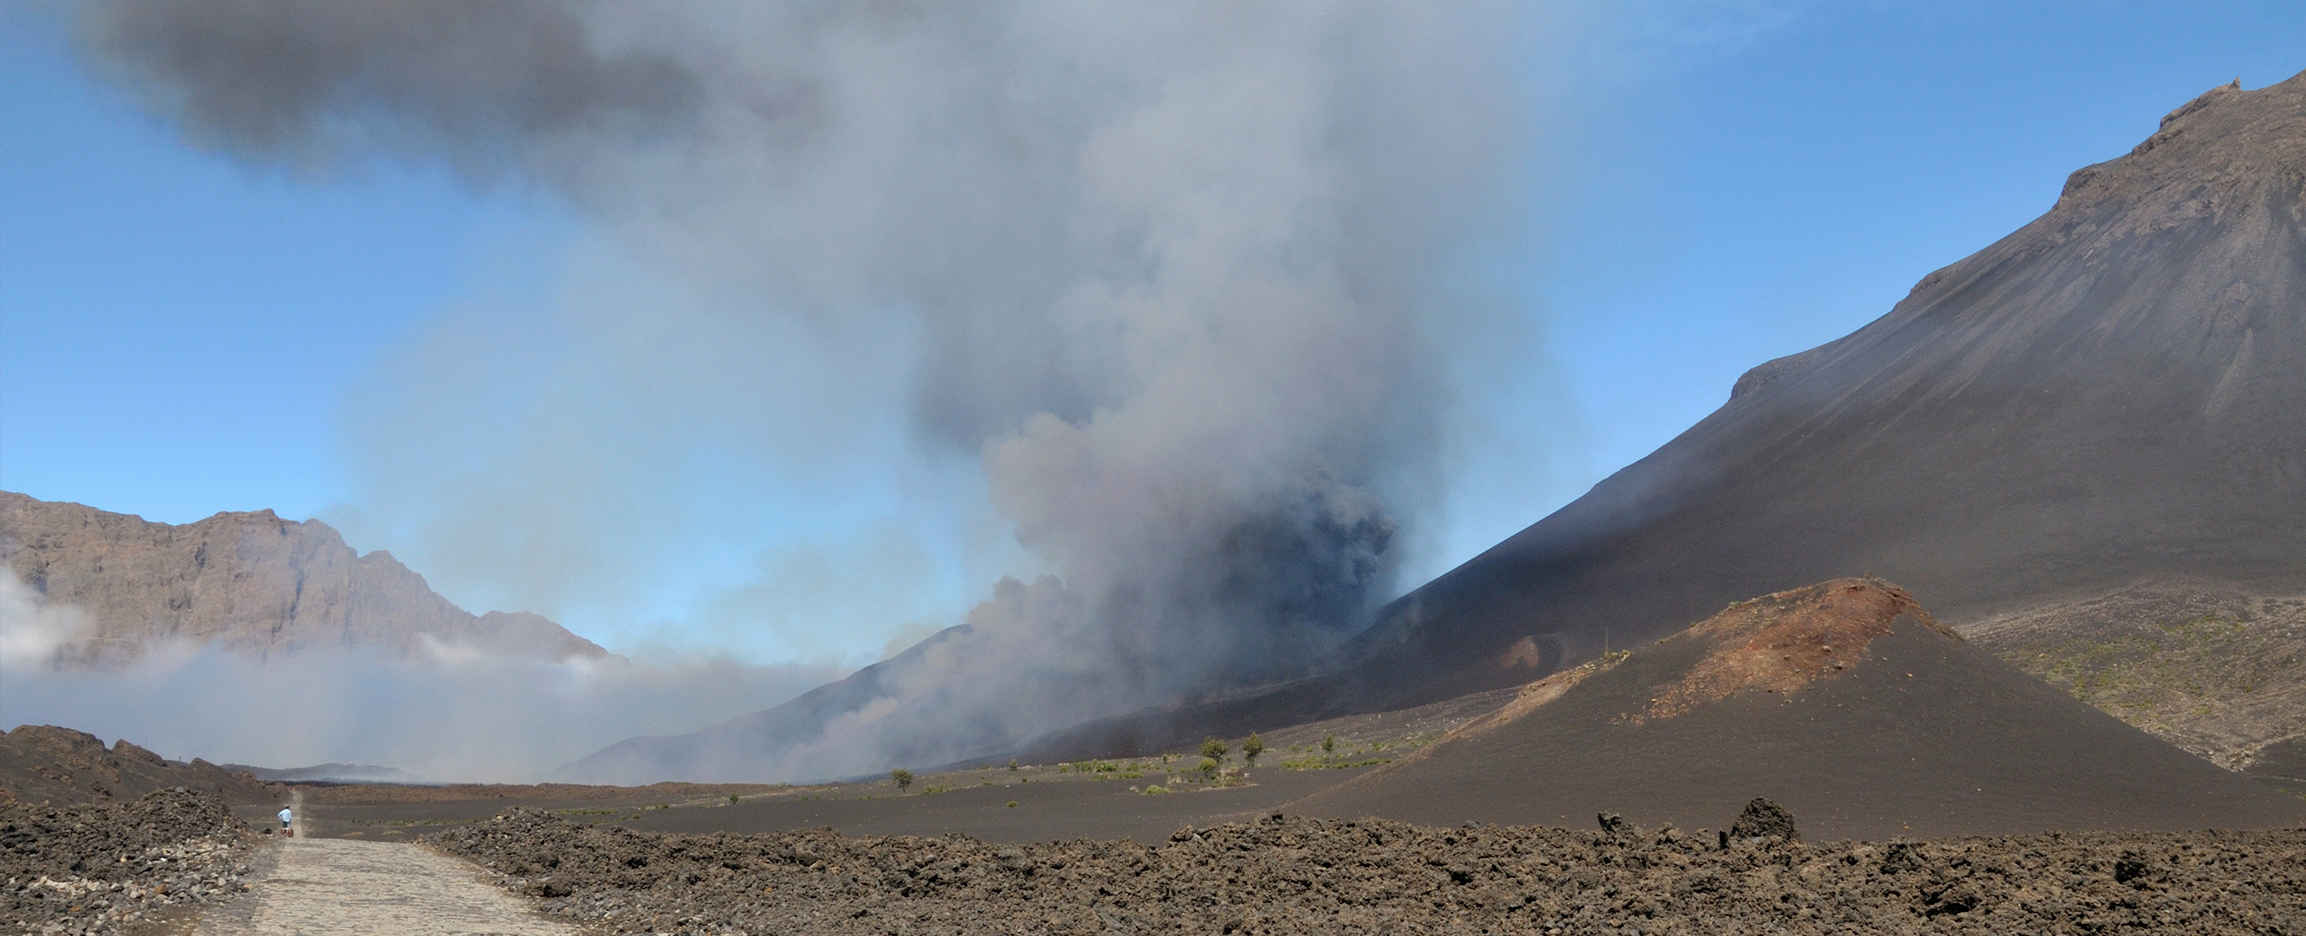 Volcanes en Cabo Verde Fogo, aun activo